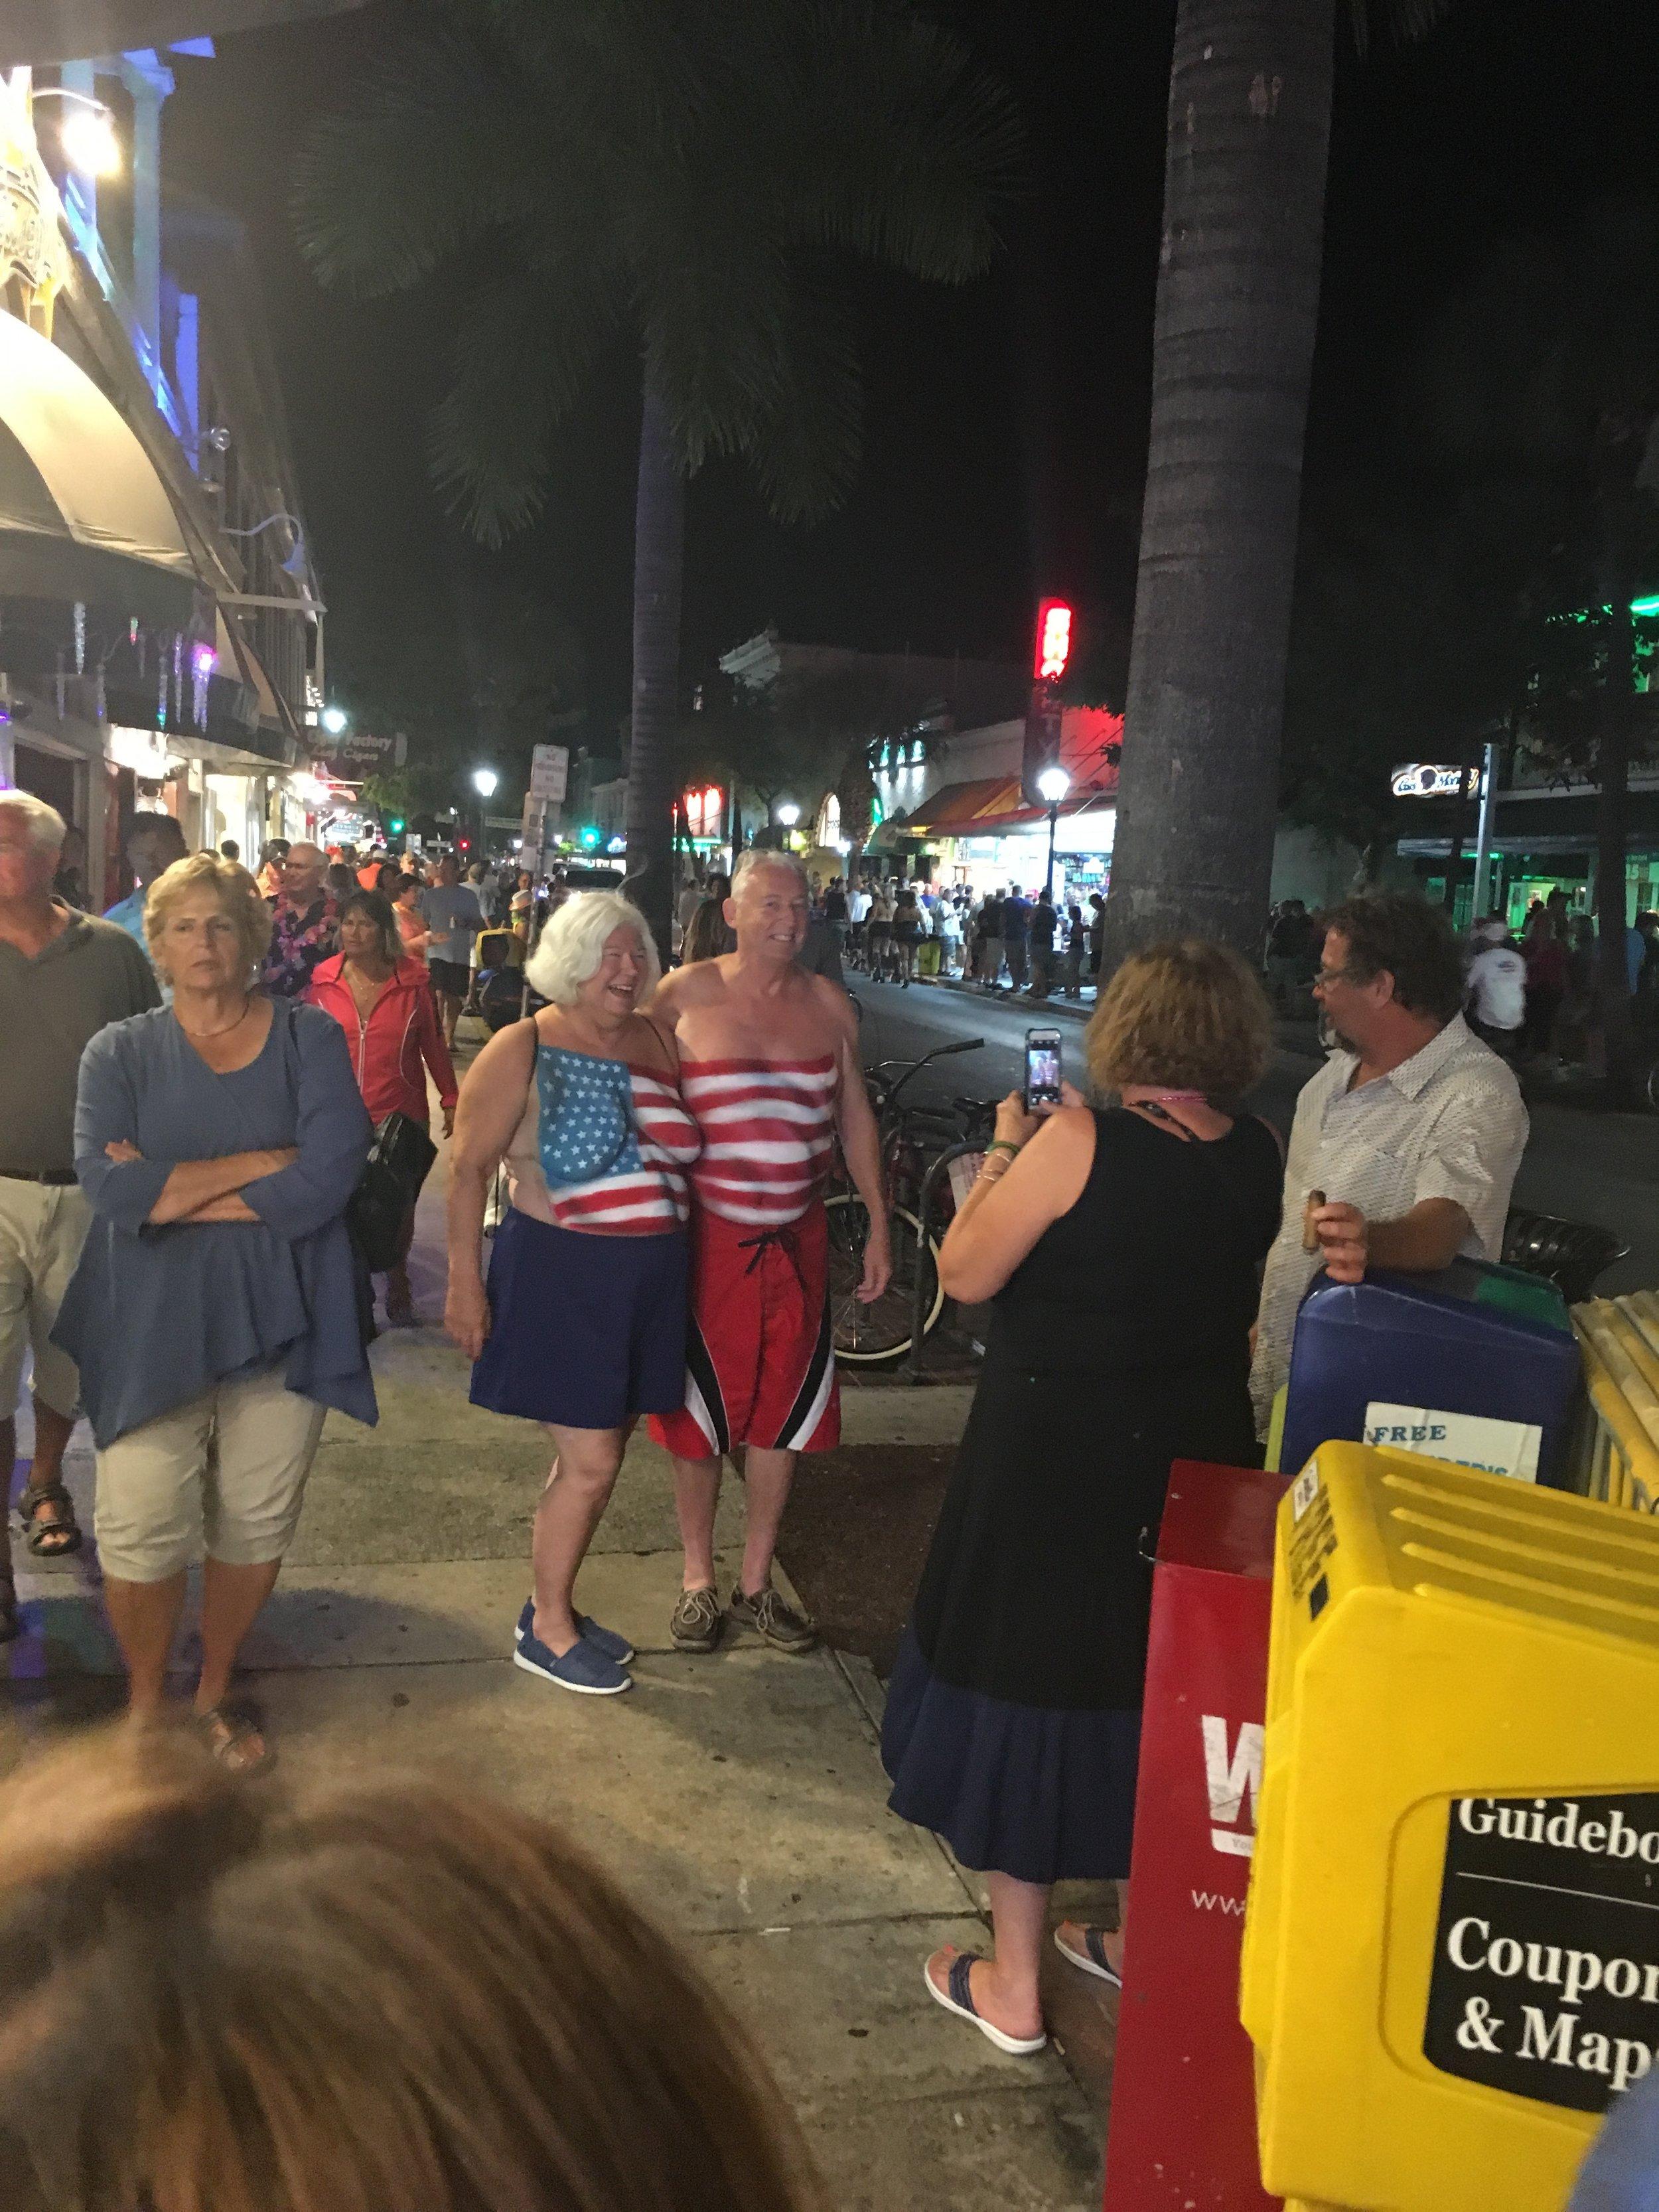 fantasy fest 2016 key west crowd shots pictures body paint nudity american flag couple patriotic